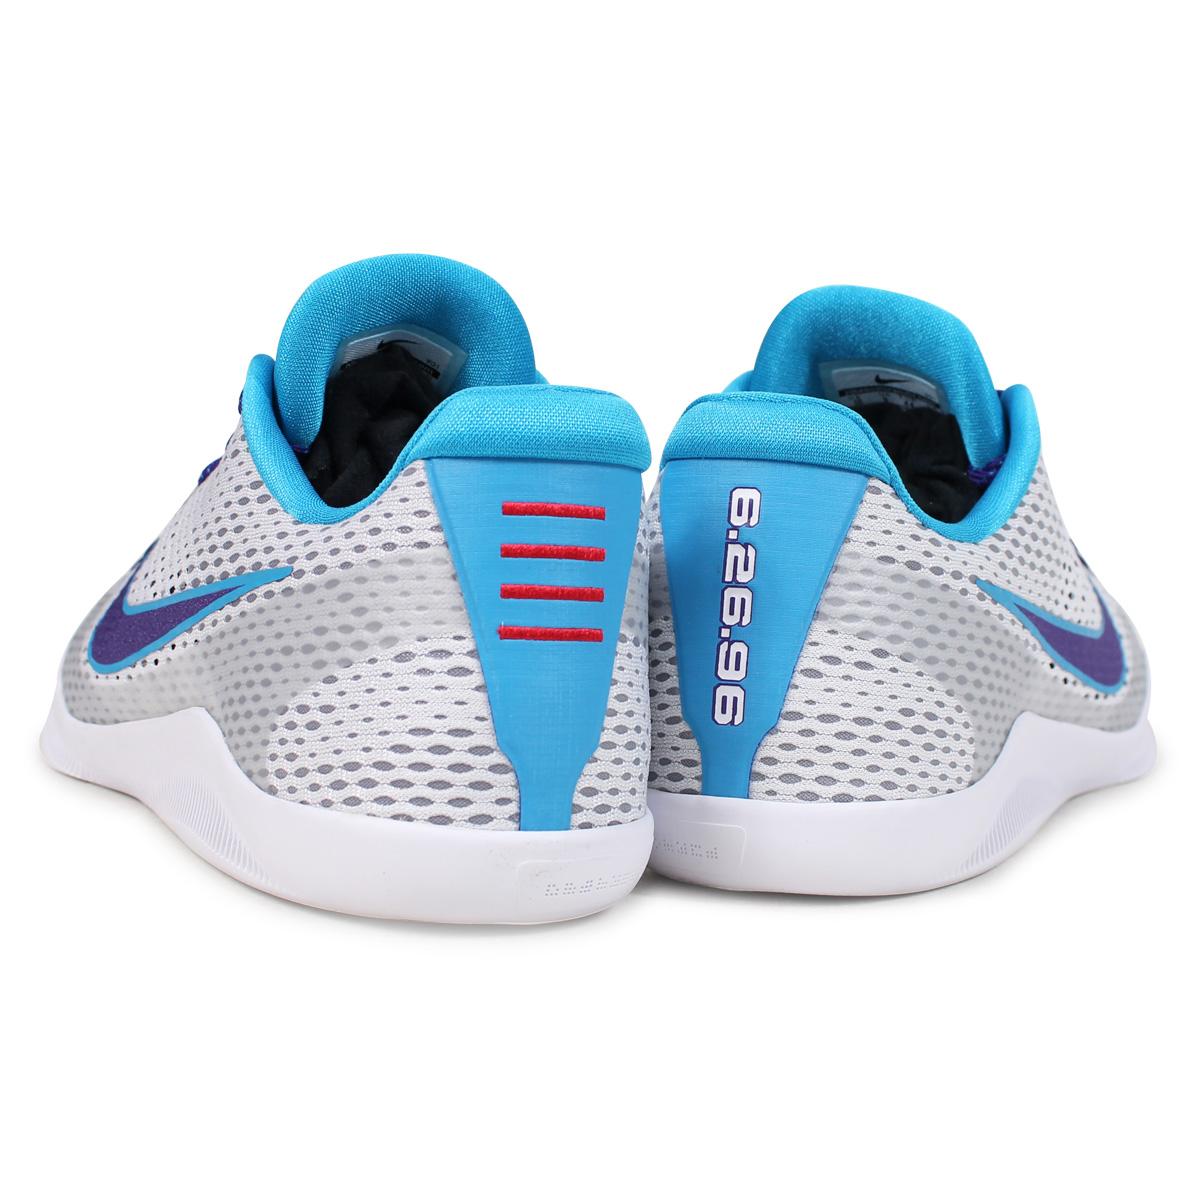 buy popular dc505 f8fc1 NIKE KOBE 11 HORNETS DRAFT DAY Nike Corby 11 sneakers men 836,183-154 white  185